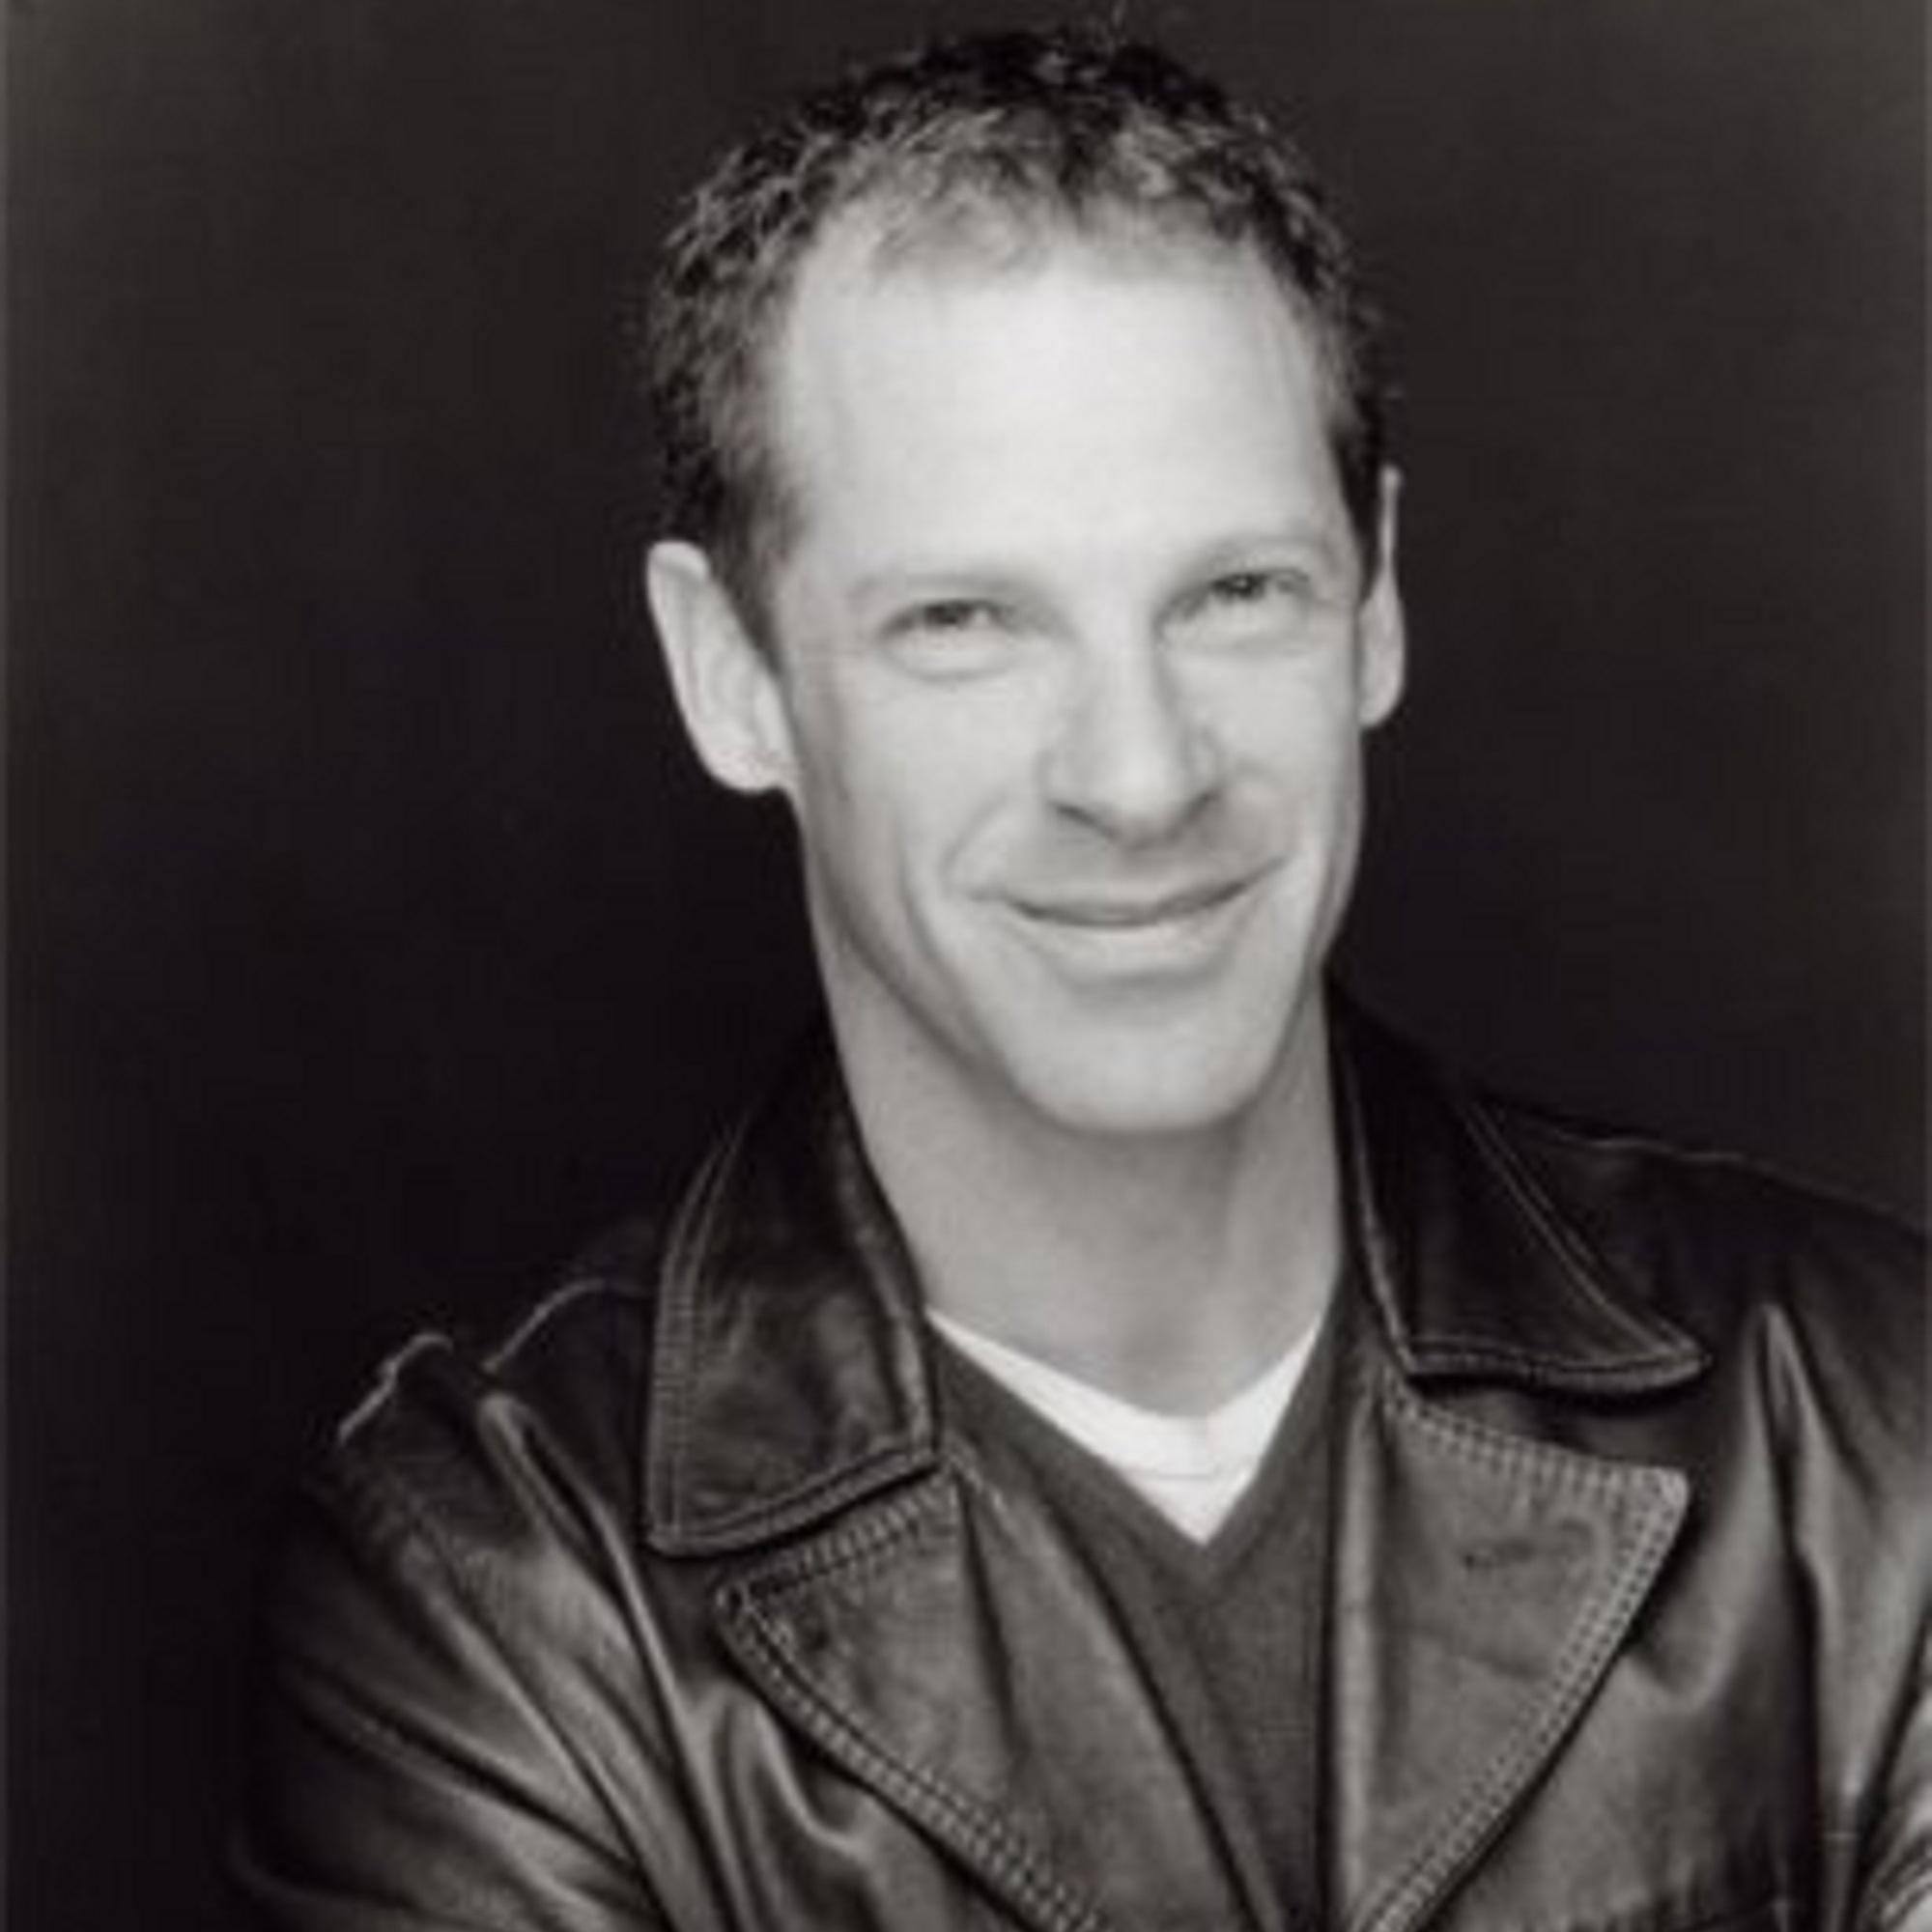 JORDAN MERKUR -DIRECTOR